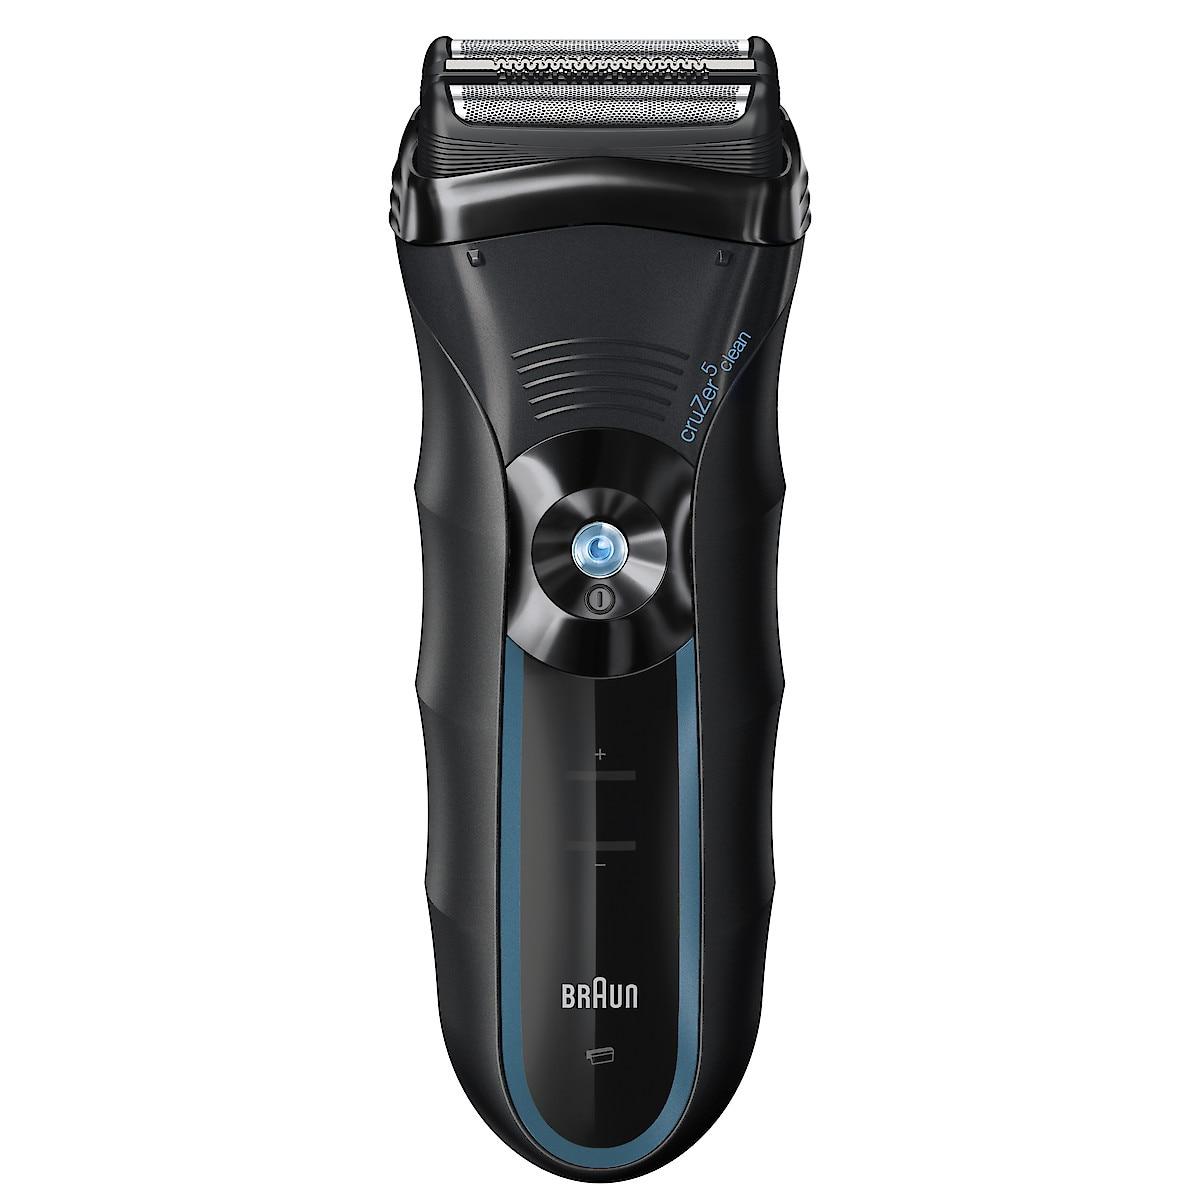 Rakapparat Braun CruZer 5 clean shave